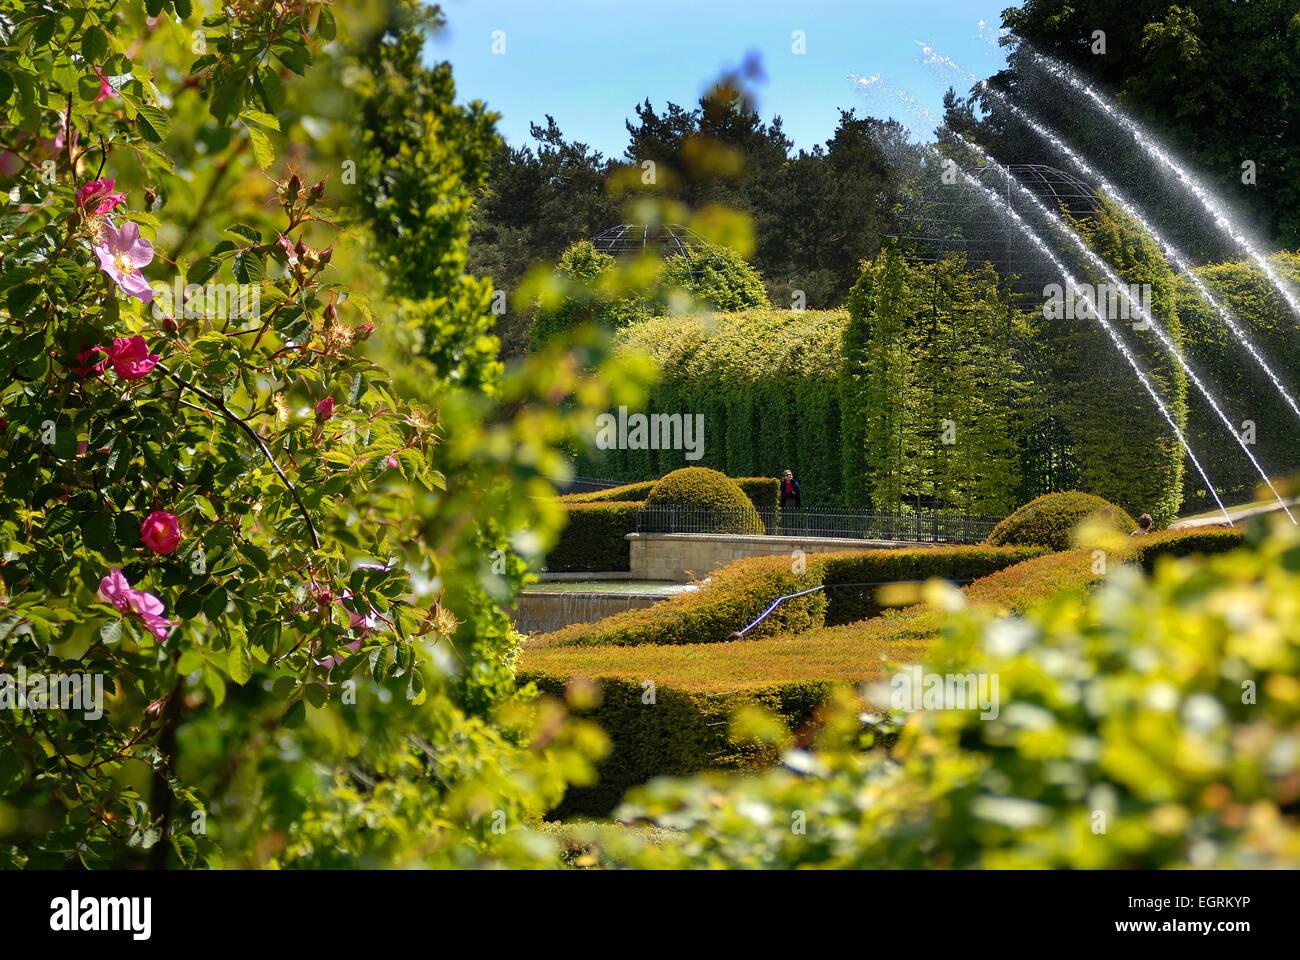 The Alnwick Garden - Stock Image